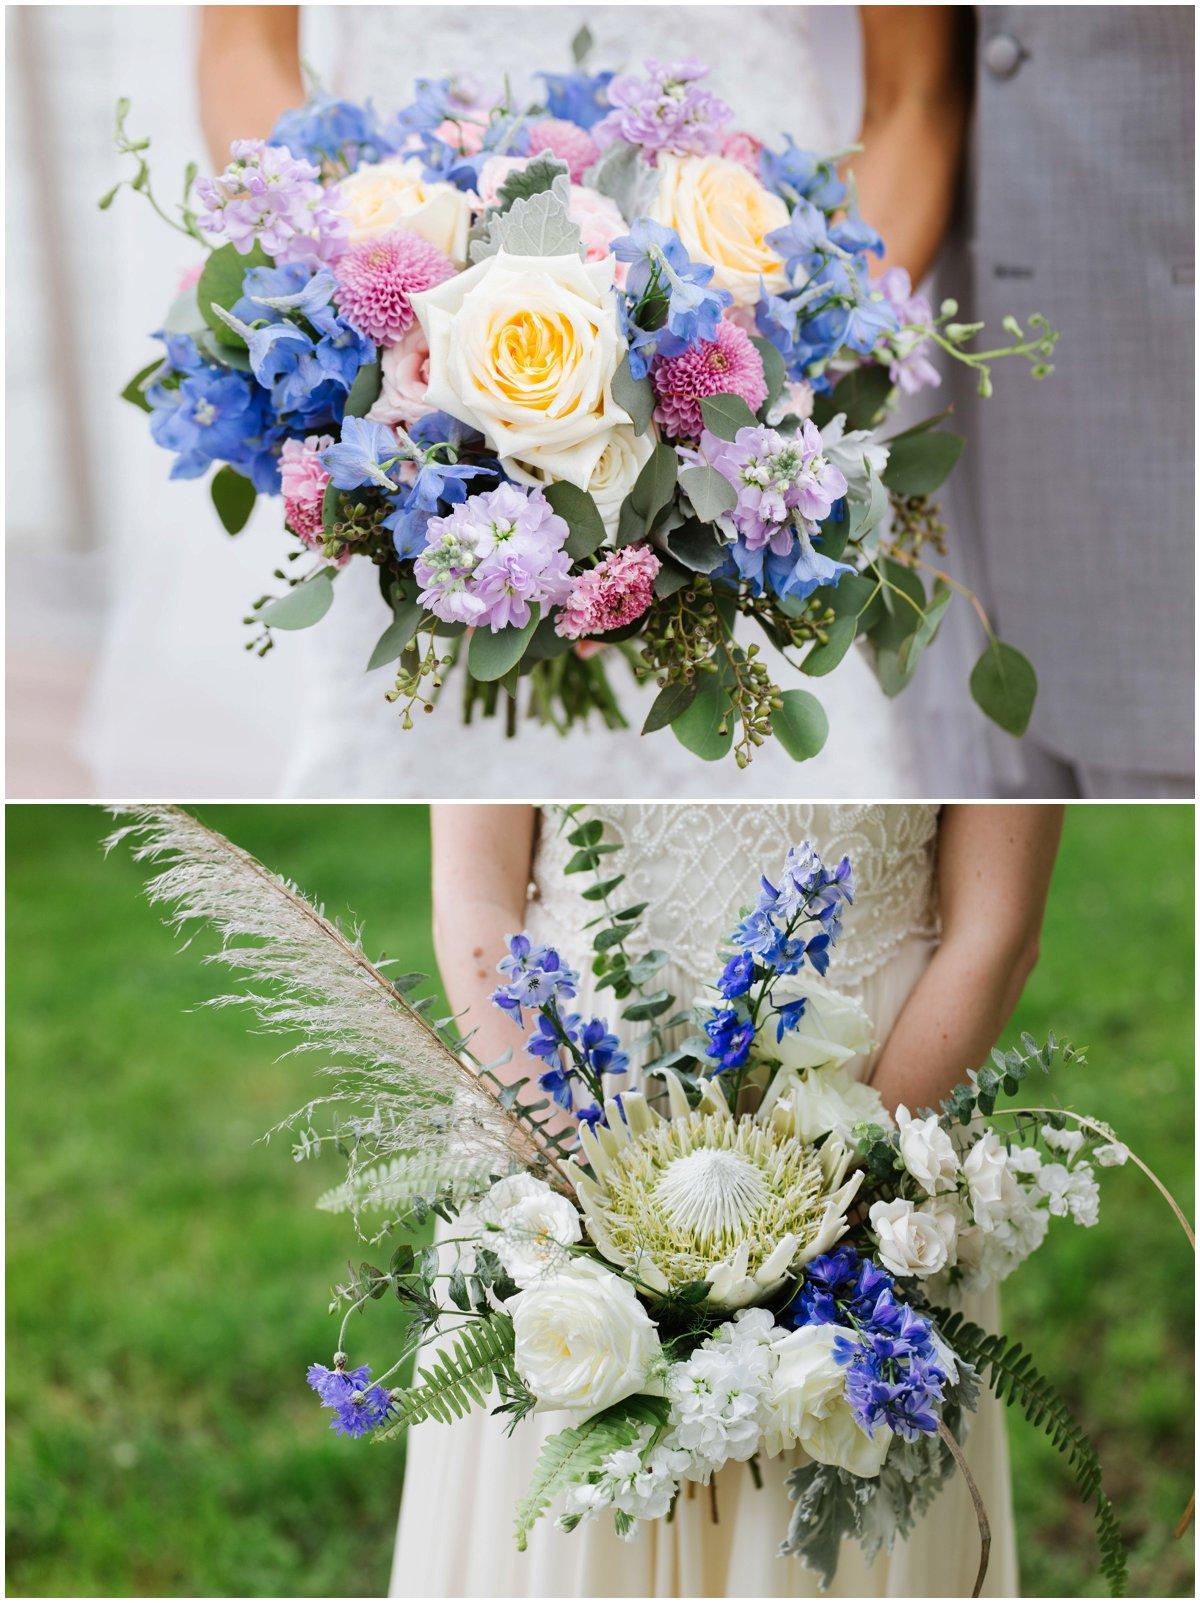 urban-row-photography-rosewood-farms-garden-bridal-bouquet_0008.jpg